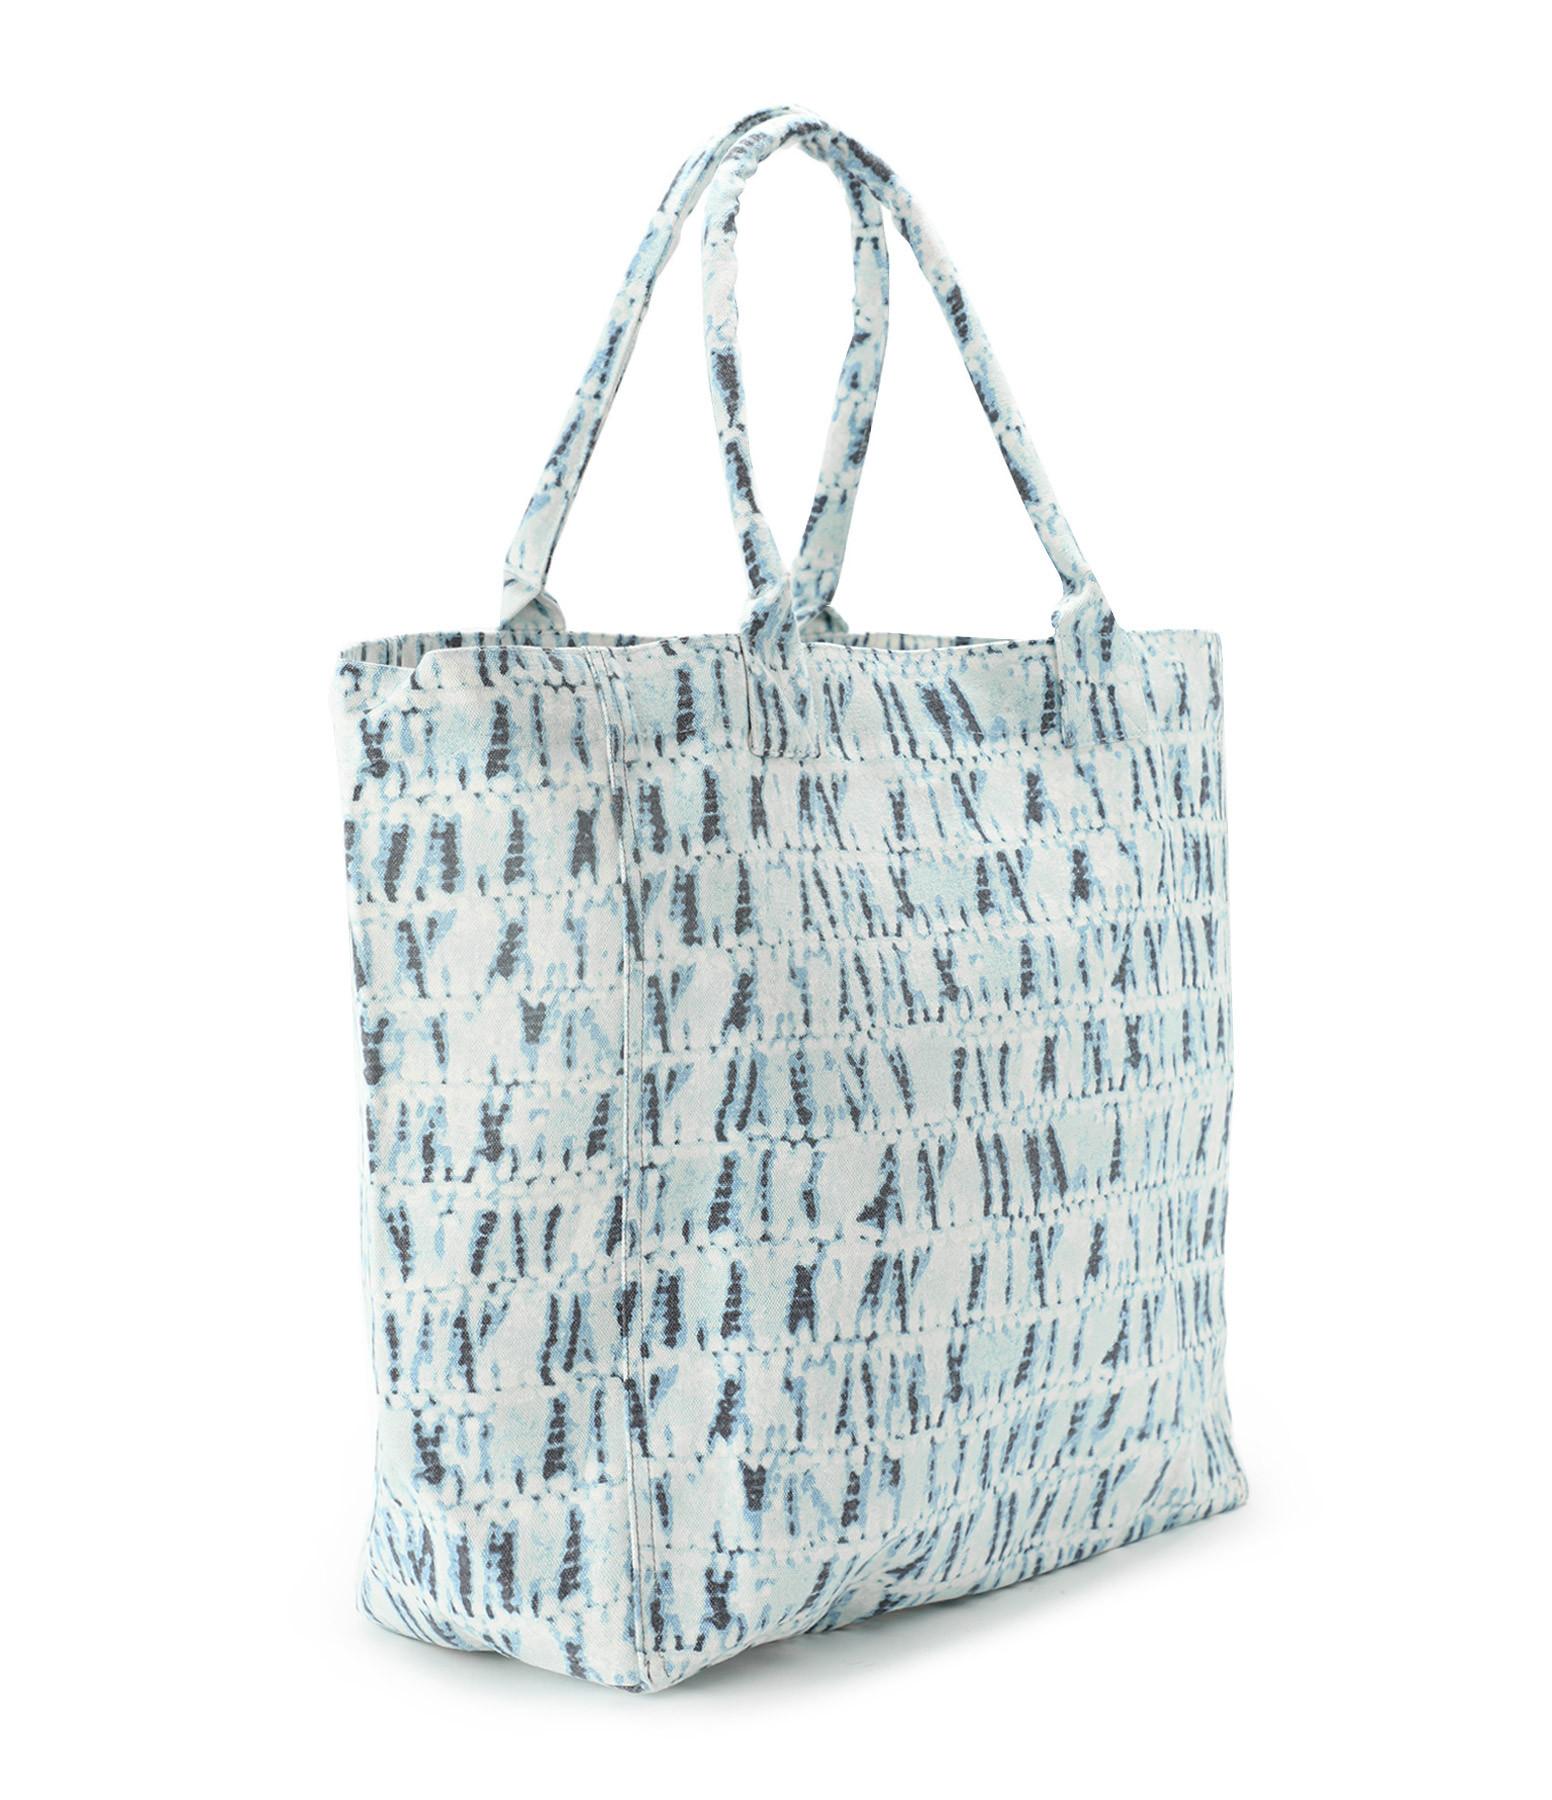 ISABEL MARANT - Sac Cabas Yenky Coton Imprimé Bleu